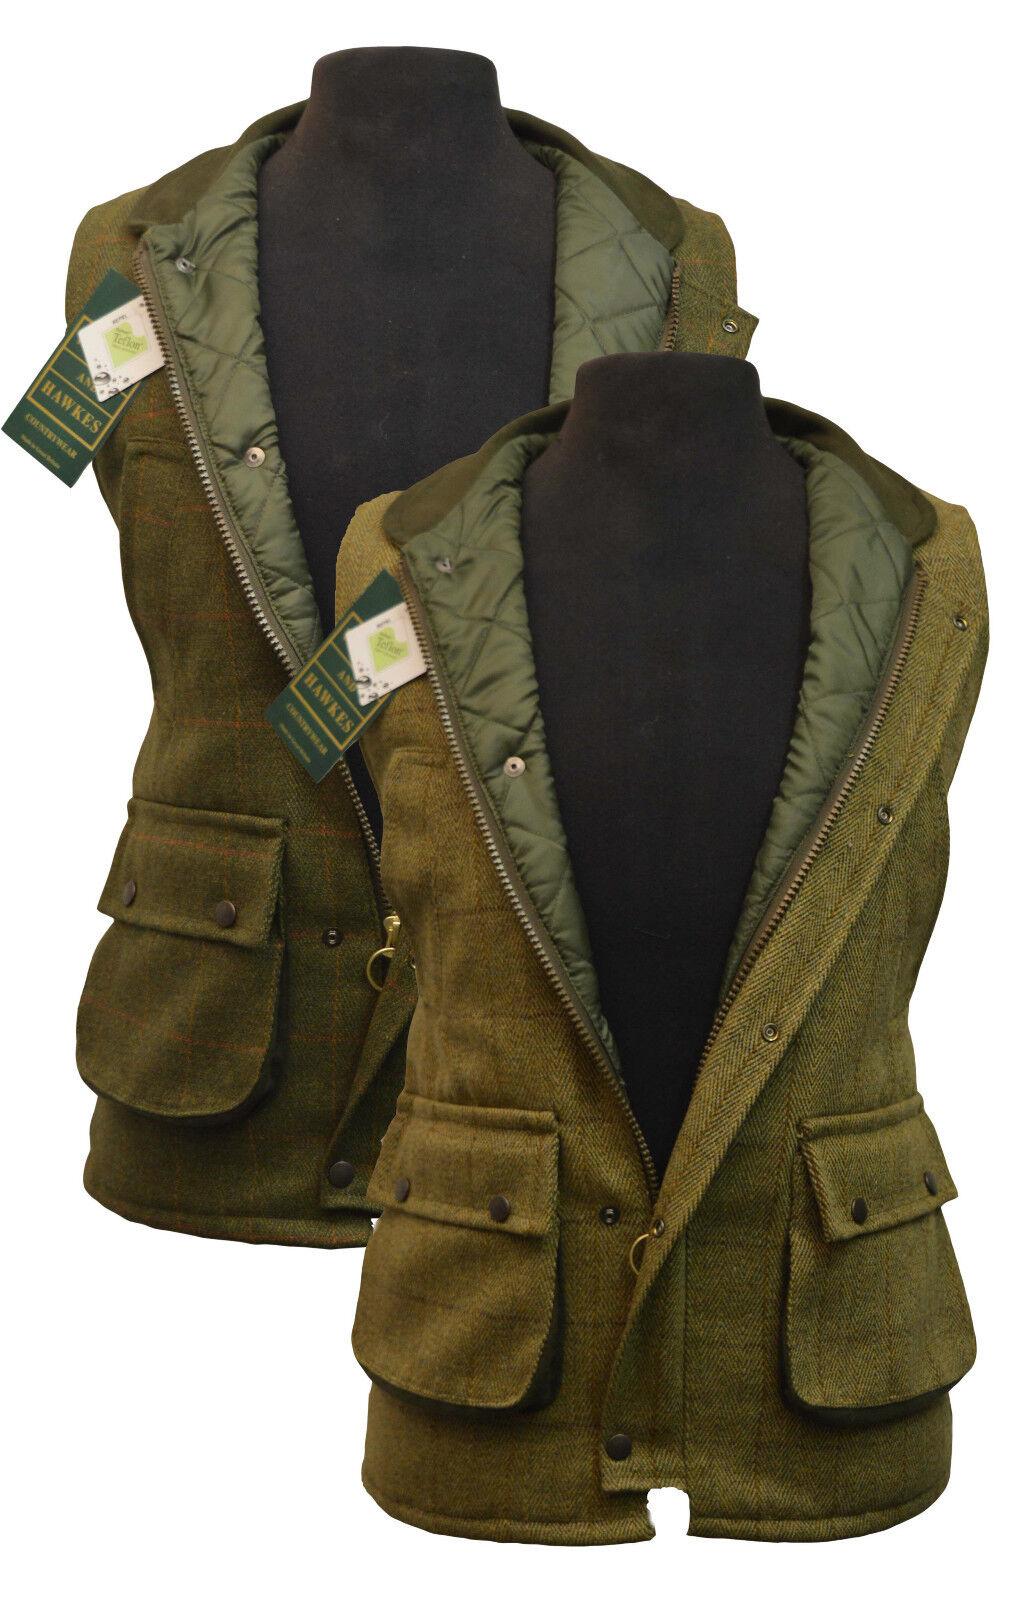 Country TWEED waistcoat GILET TEFLON NEW QUILTED Bodywarmer LIGHT DARK SAGE